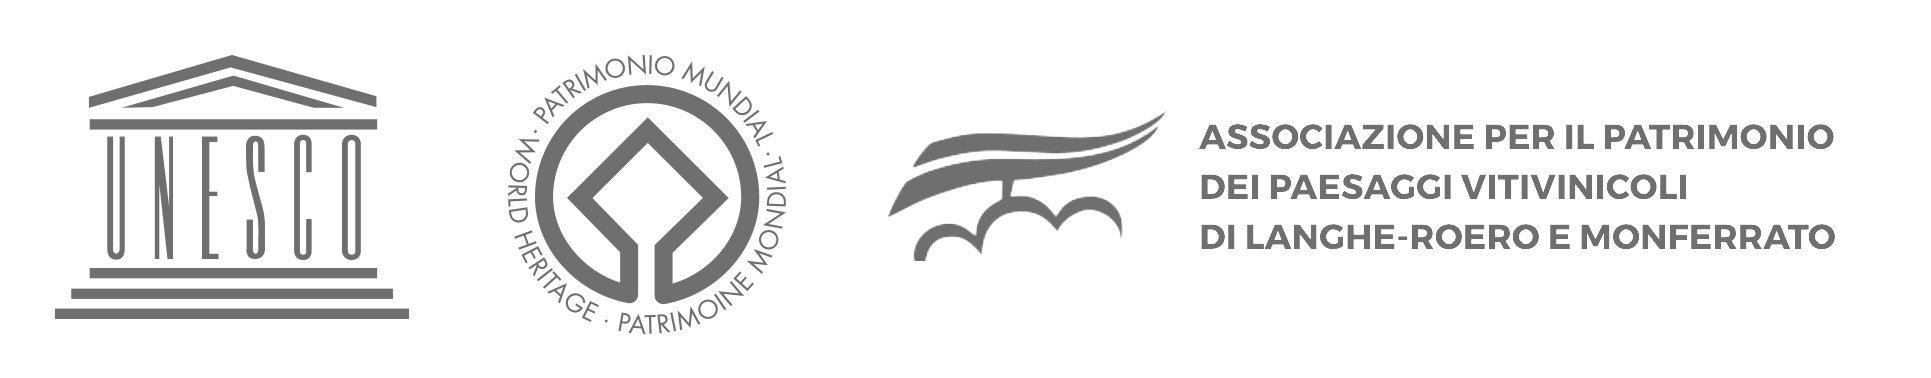 Unesco-langhe-patrimonio-mondiale